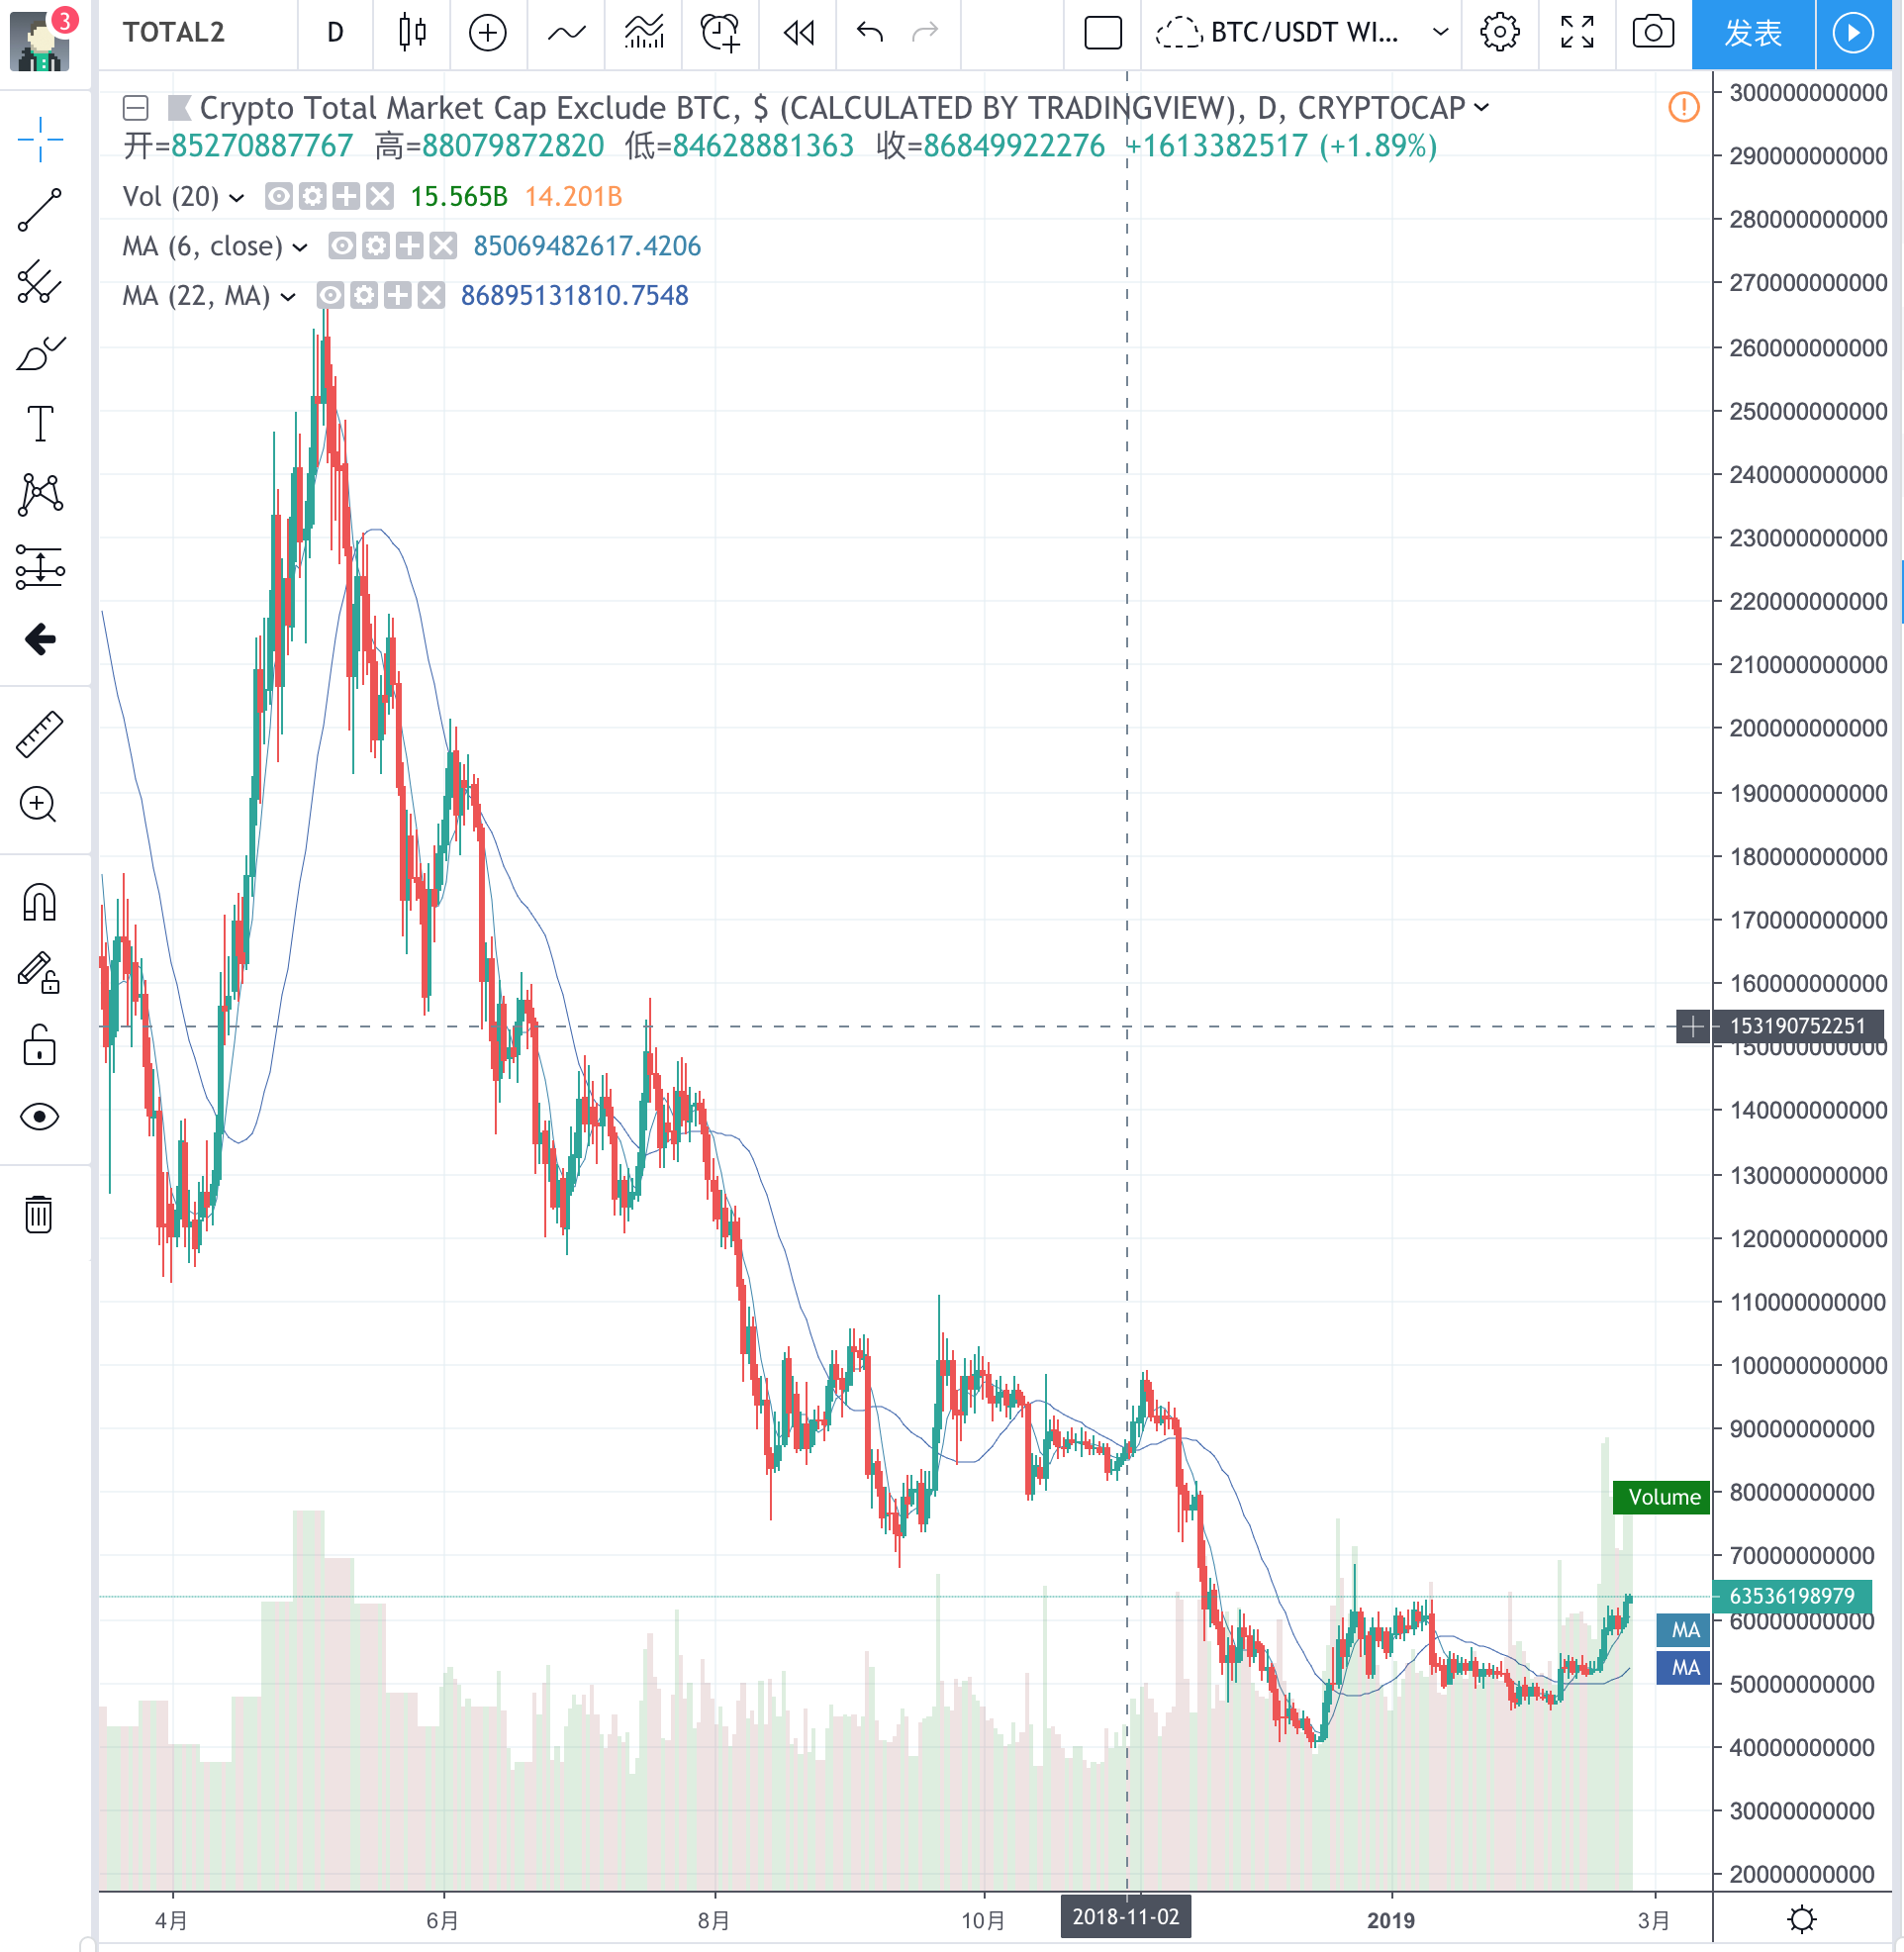 market cap exclude BTC